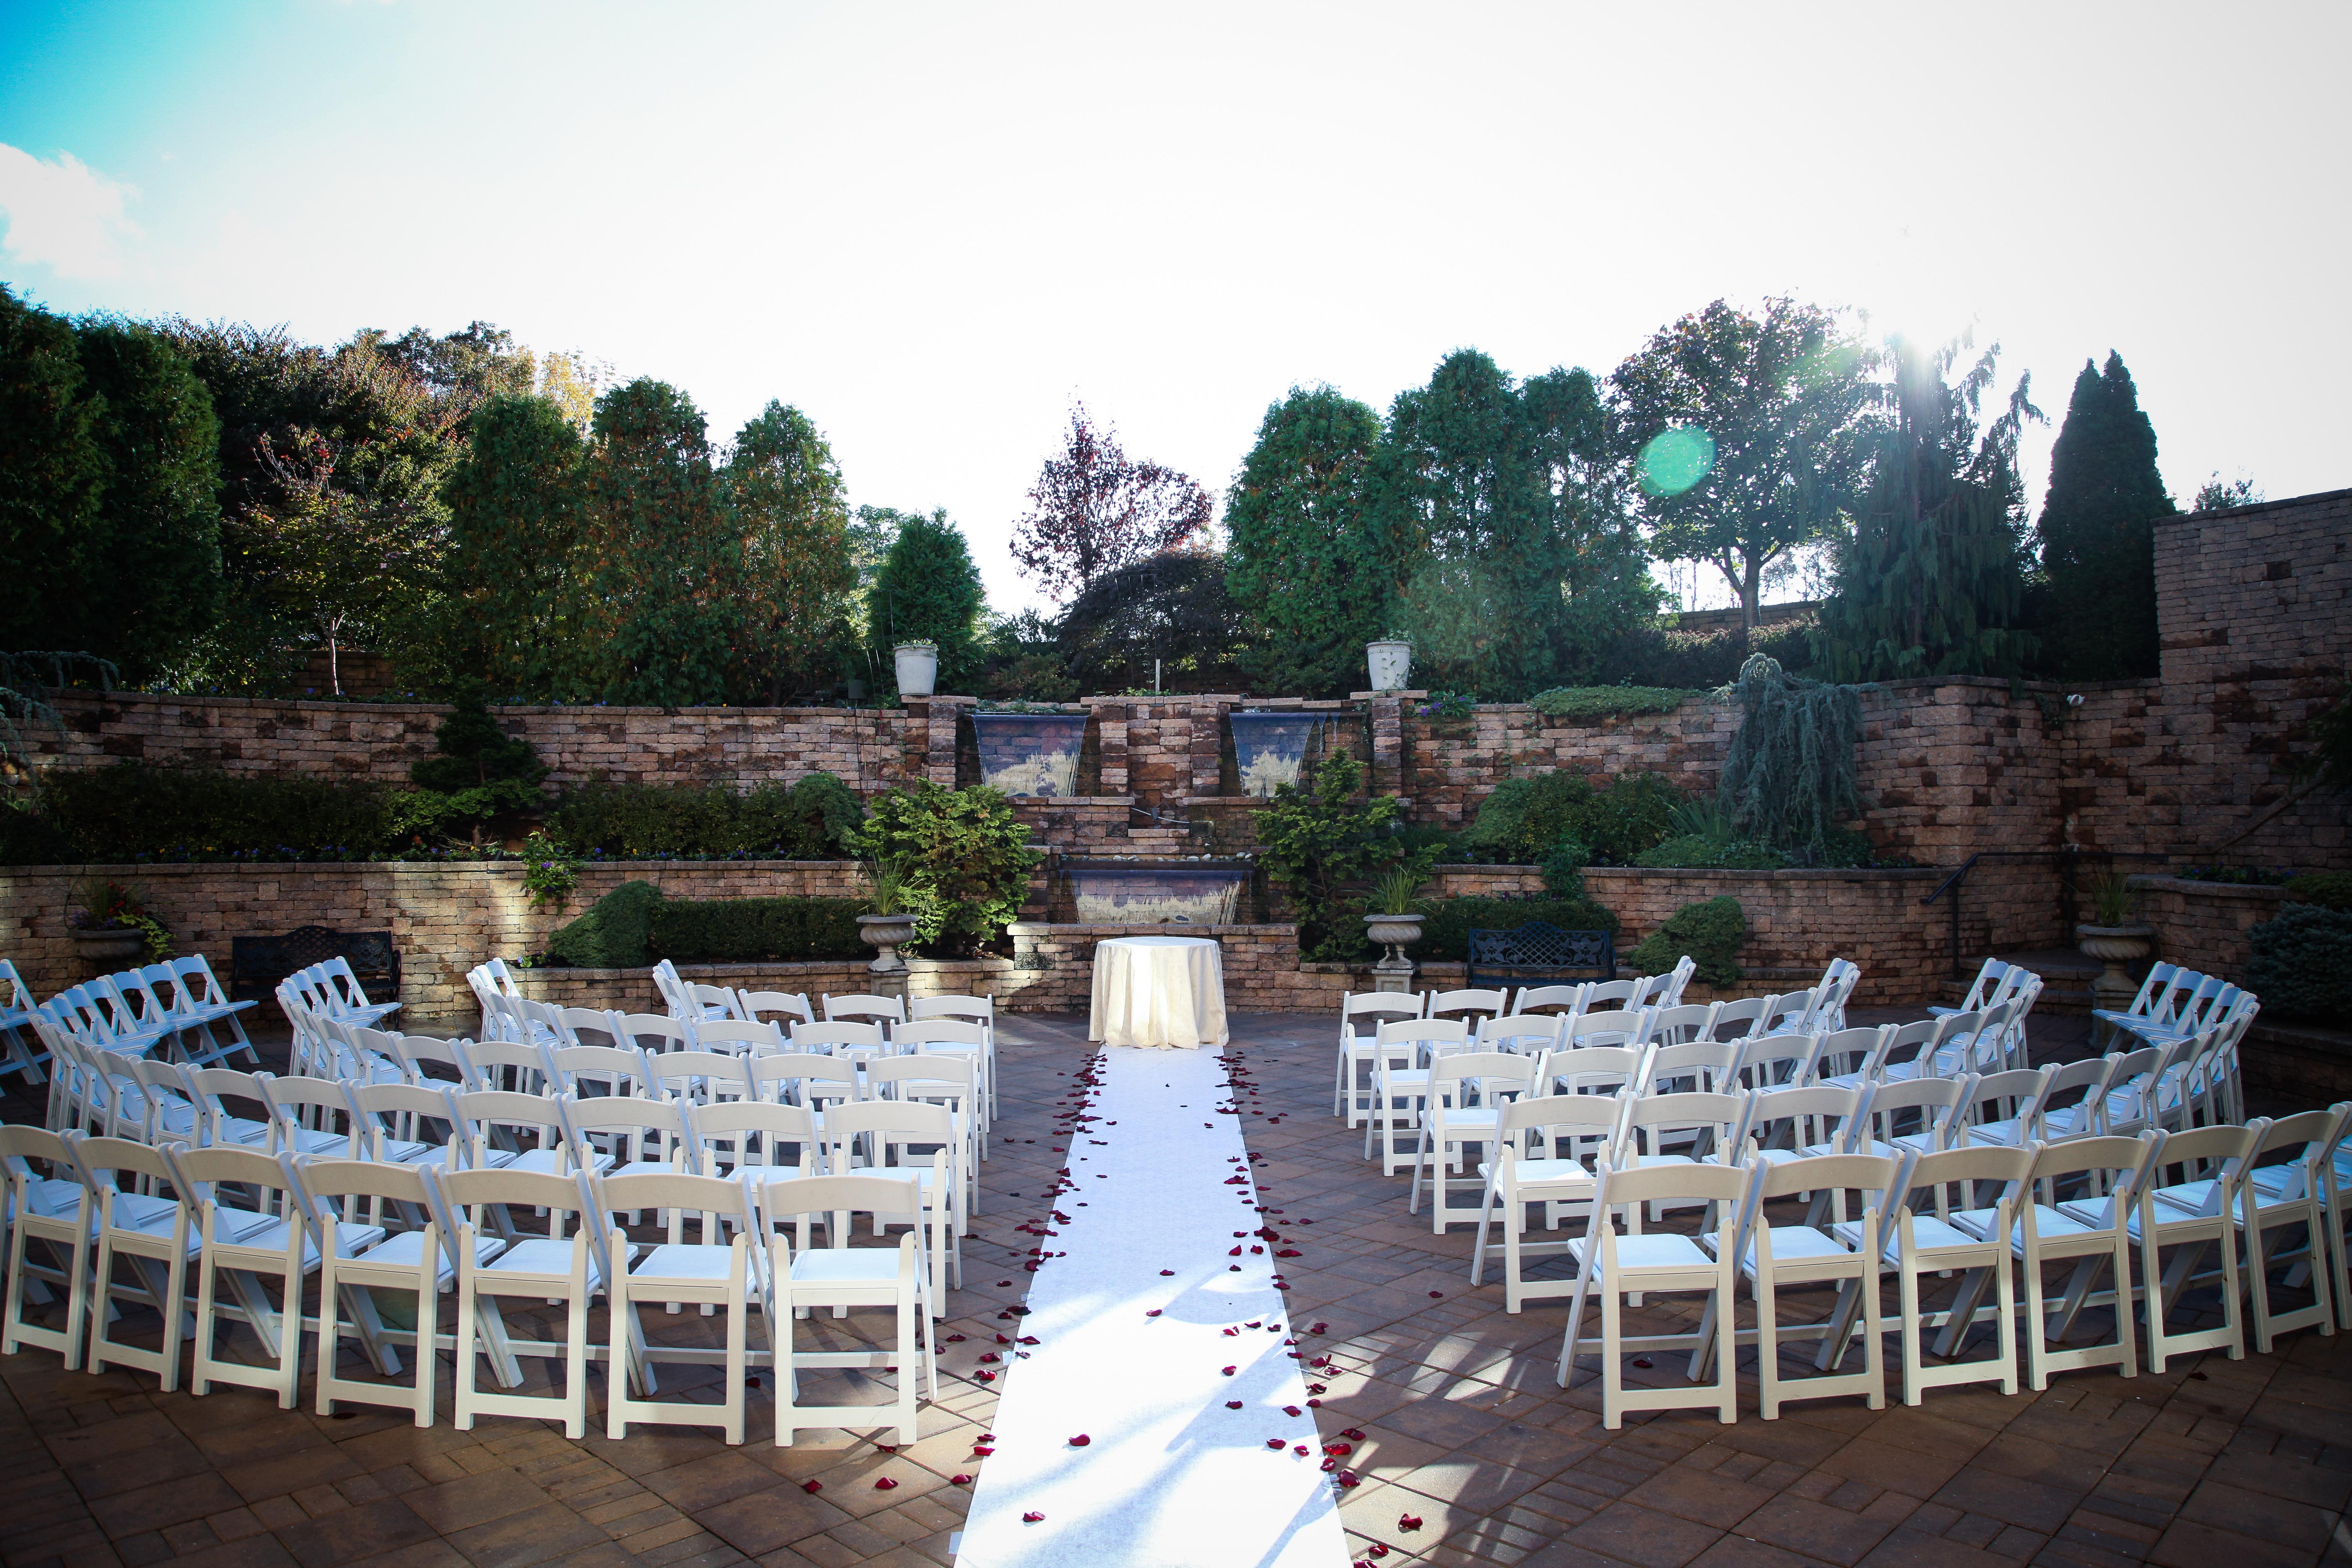 somerset nj wedding venues the imperia venue for